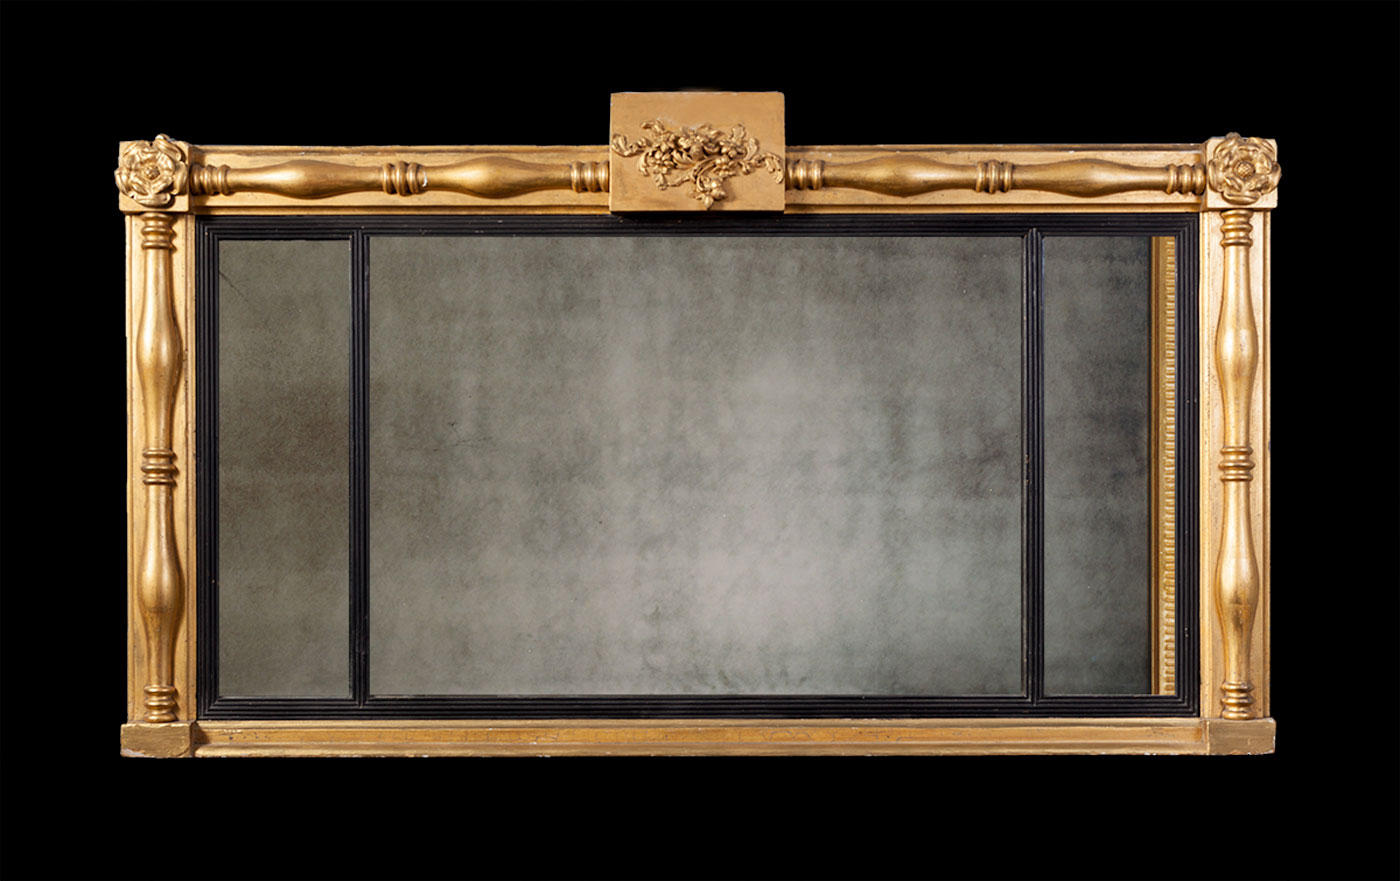 over mantel mirror af040 mirrors ryan smith. Black Bedroom Furniture Sets. Home Design Ideas